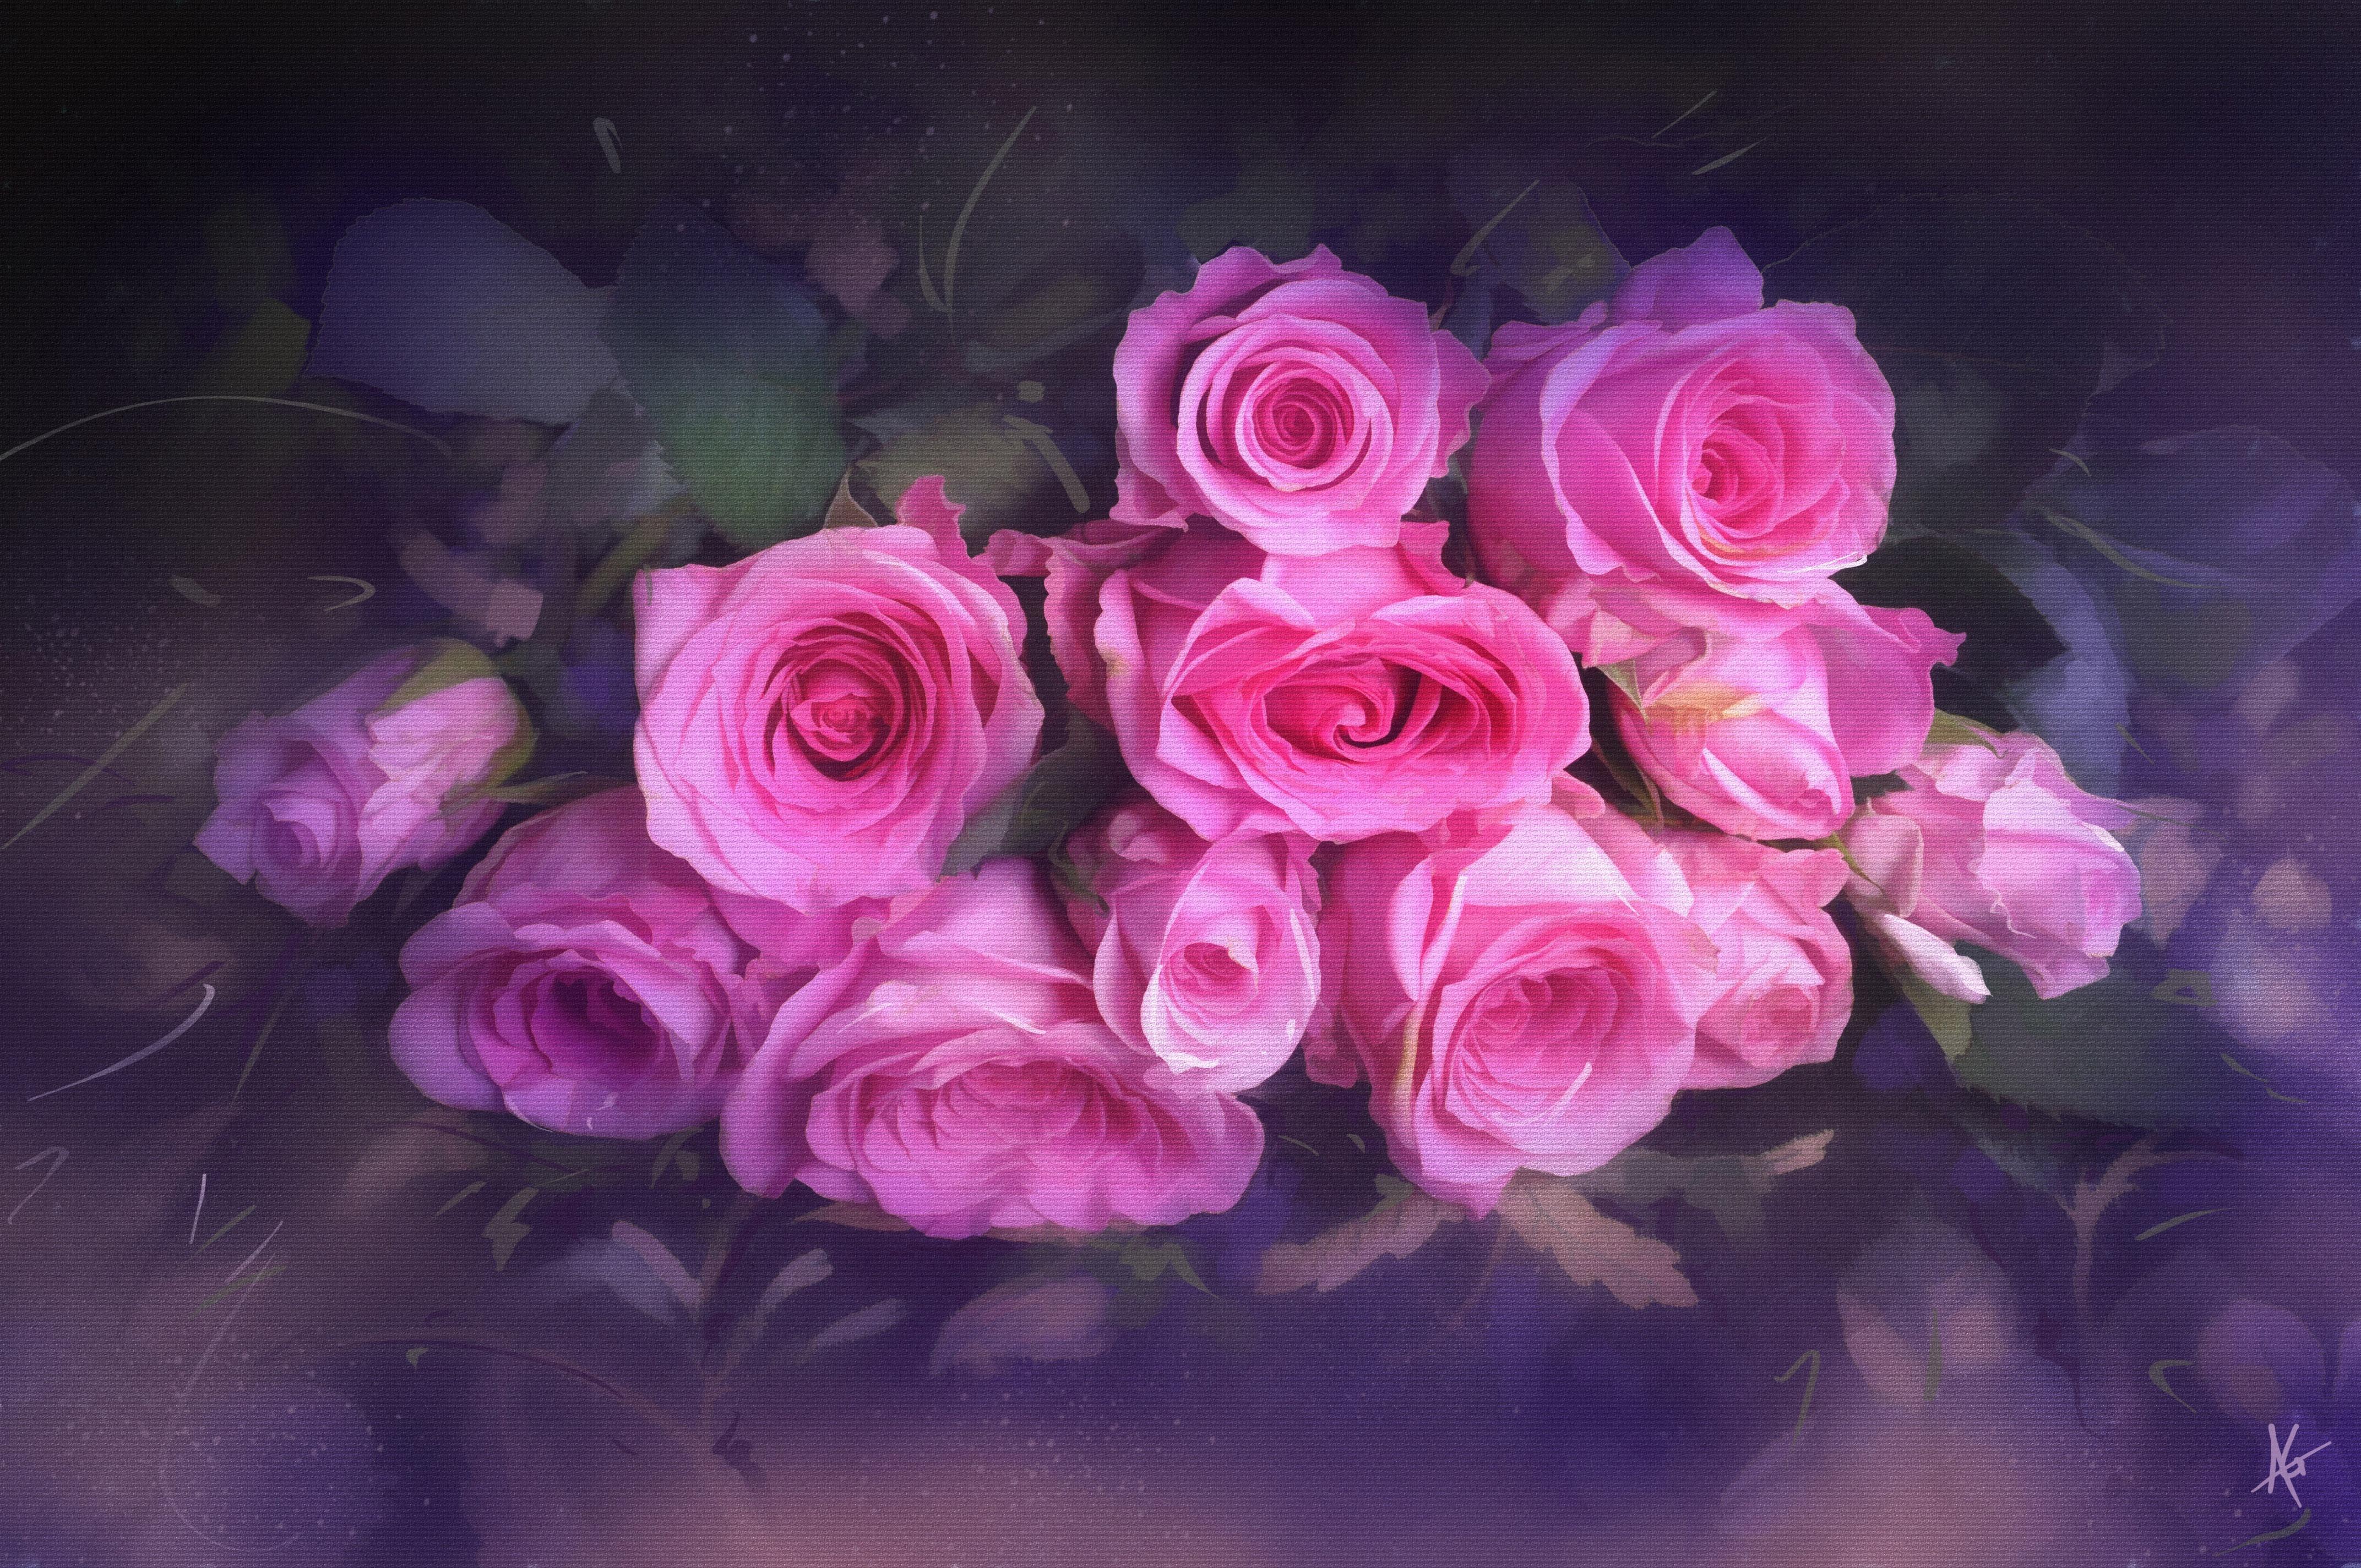 Vintage Pink Roses 4k Ultra Fondo De Pantalla HD